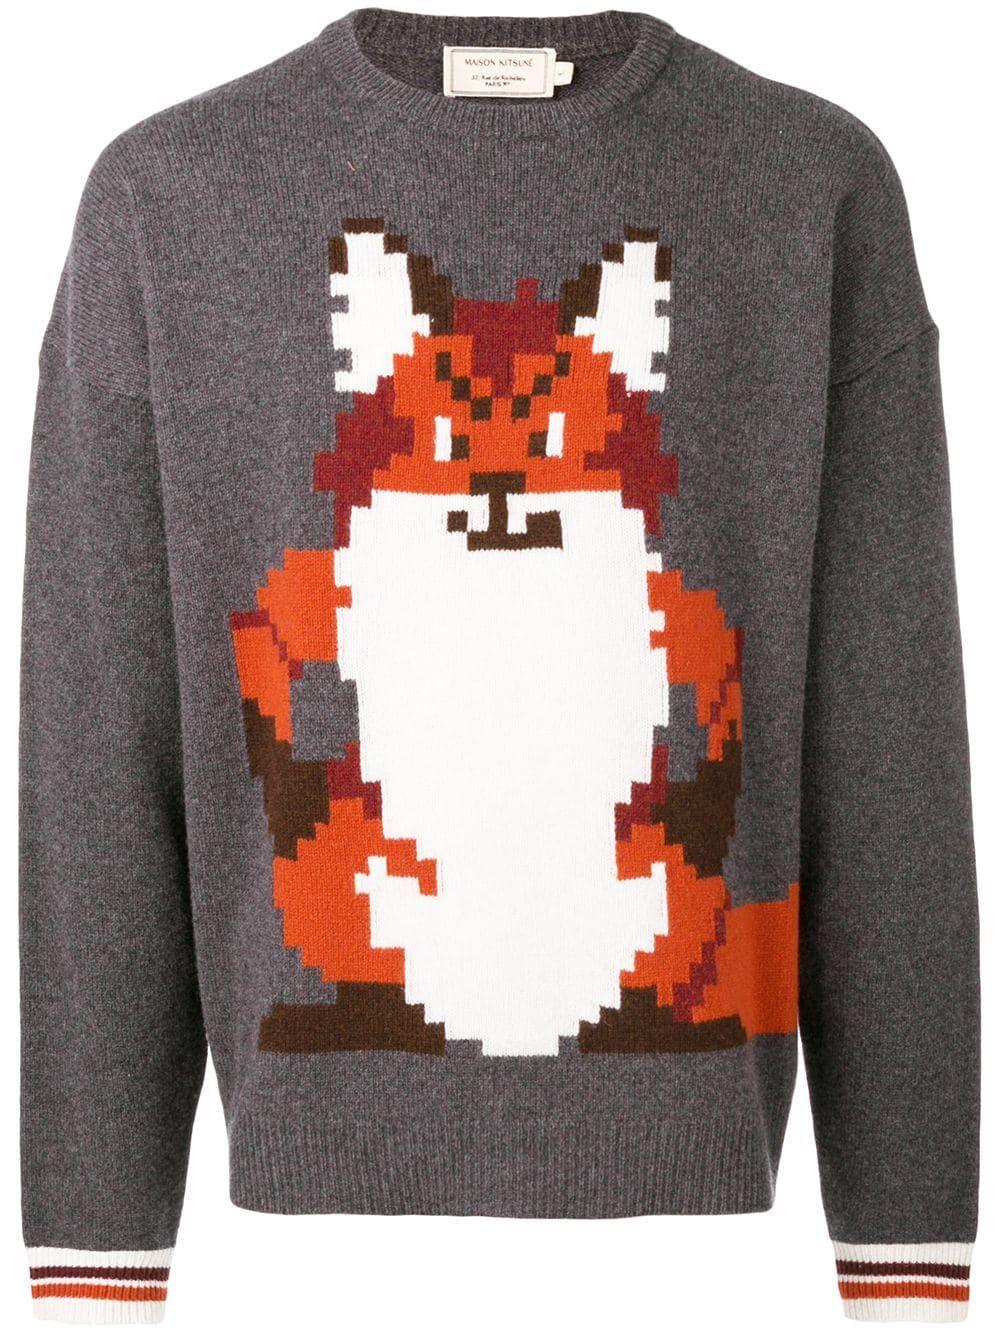 Maison Kitsune Maison Kitsune Roundneck Fox Maisonkitsune Cloth Fox Sweater Maison Kitsune Grey Sweater [ 1334 x 1000 Pixel ]